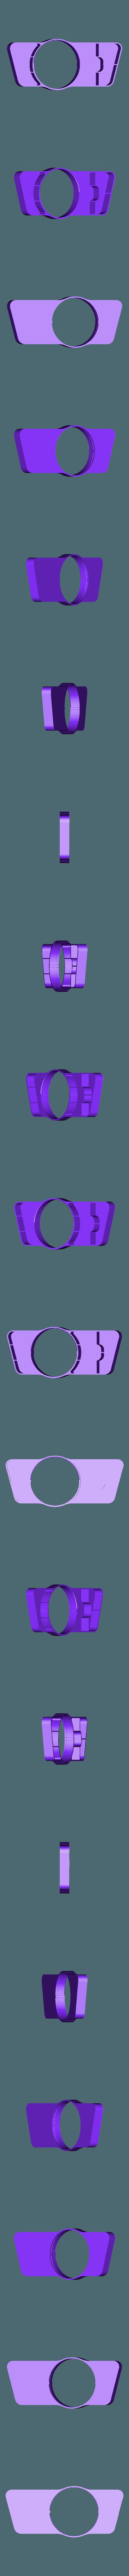 Fly_Case_v1-2_TRAY.STL Download free STL file Swivel Case 2 • 3D printable design, WalterHsiao